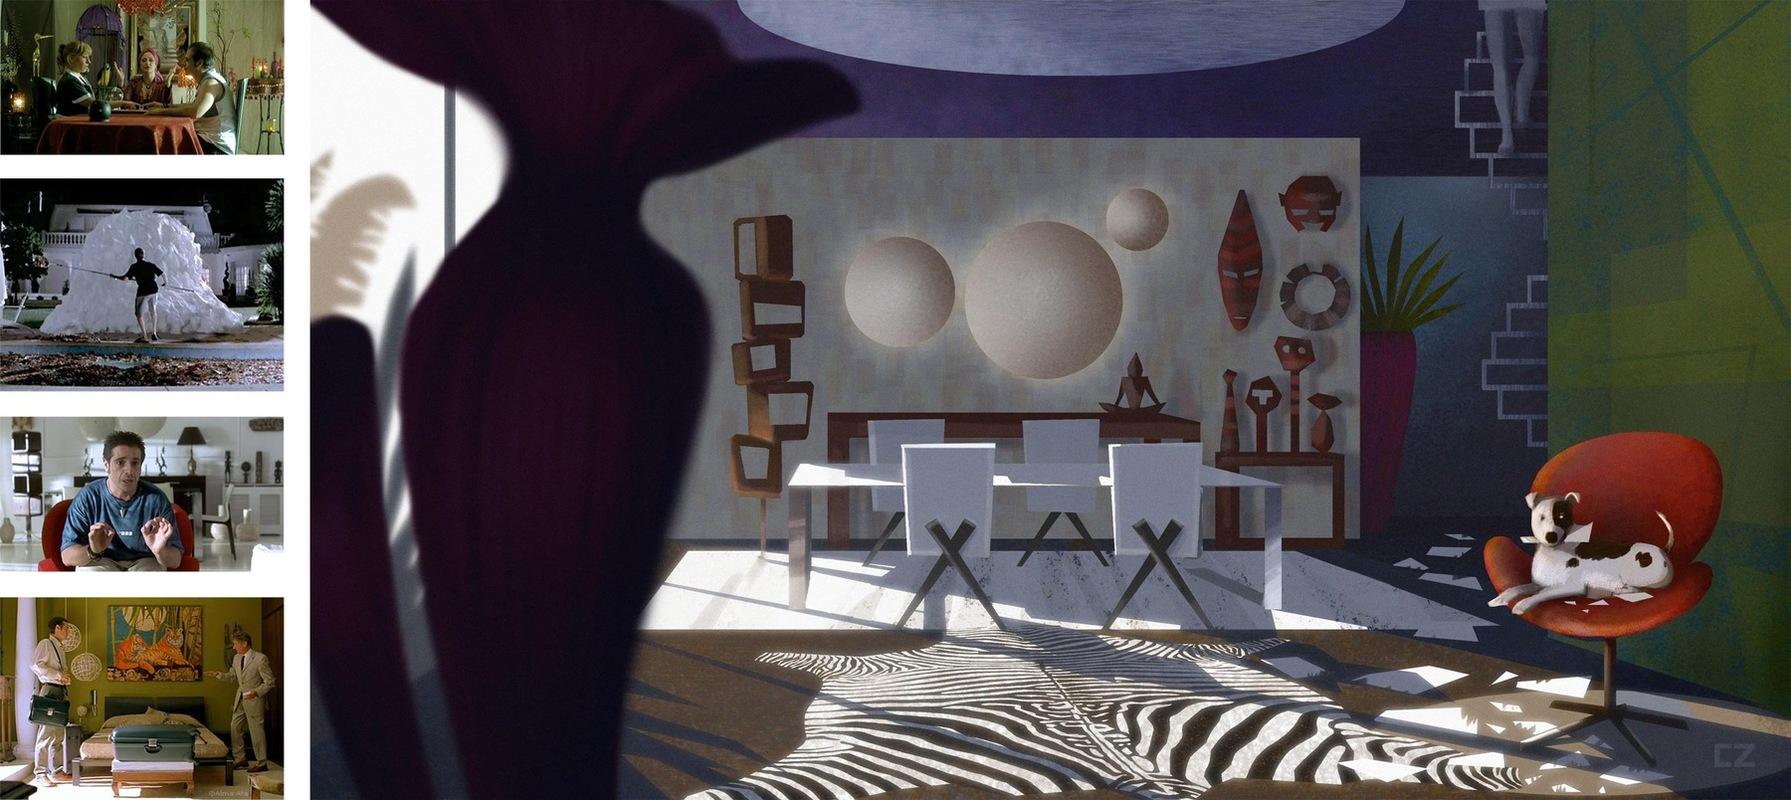 carlos zaragoza▪production designer - EL CHOCOLATE DEL LORO / 2004 / Production Designer Concept for Uncle Rafaels House